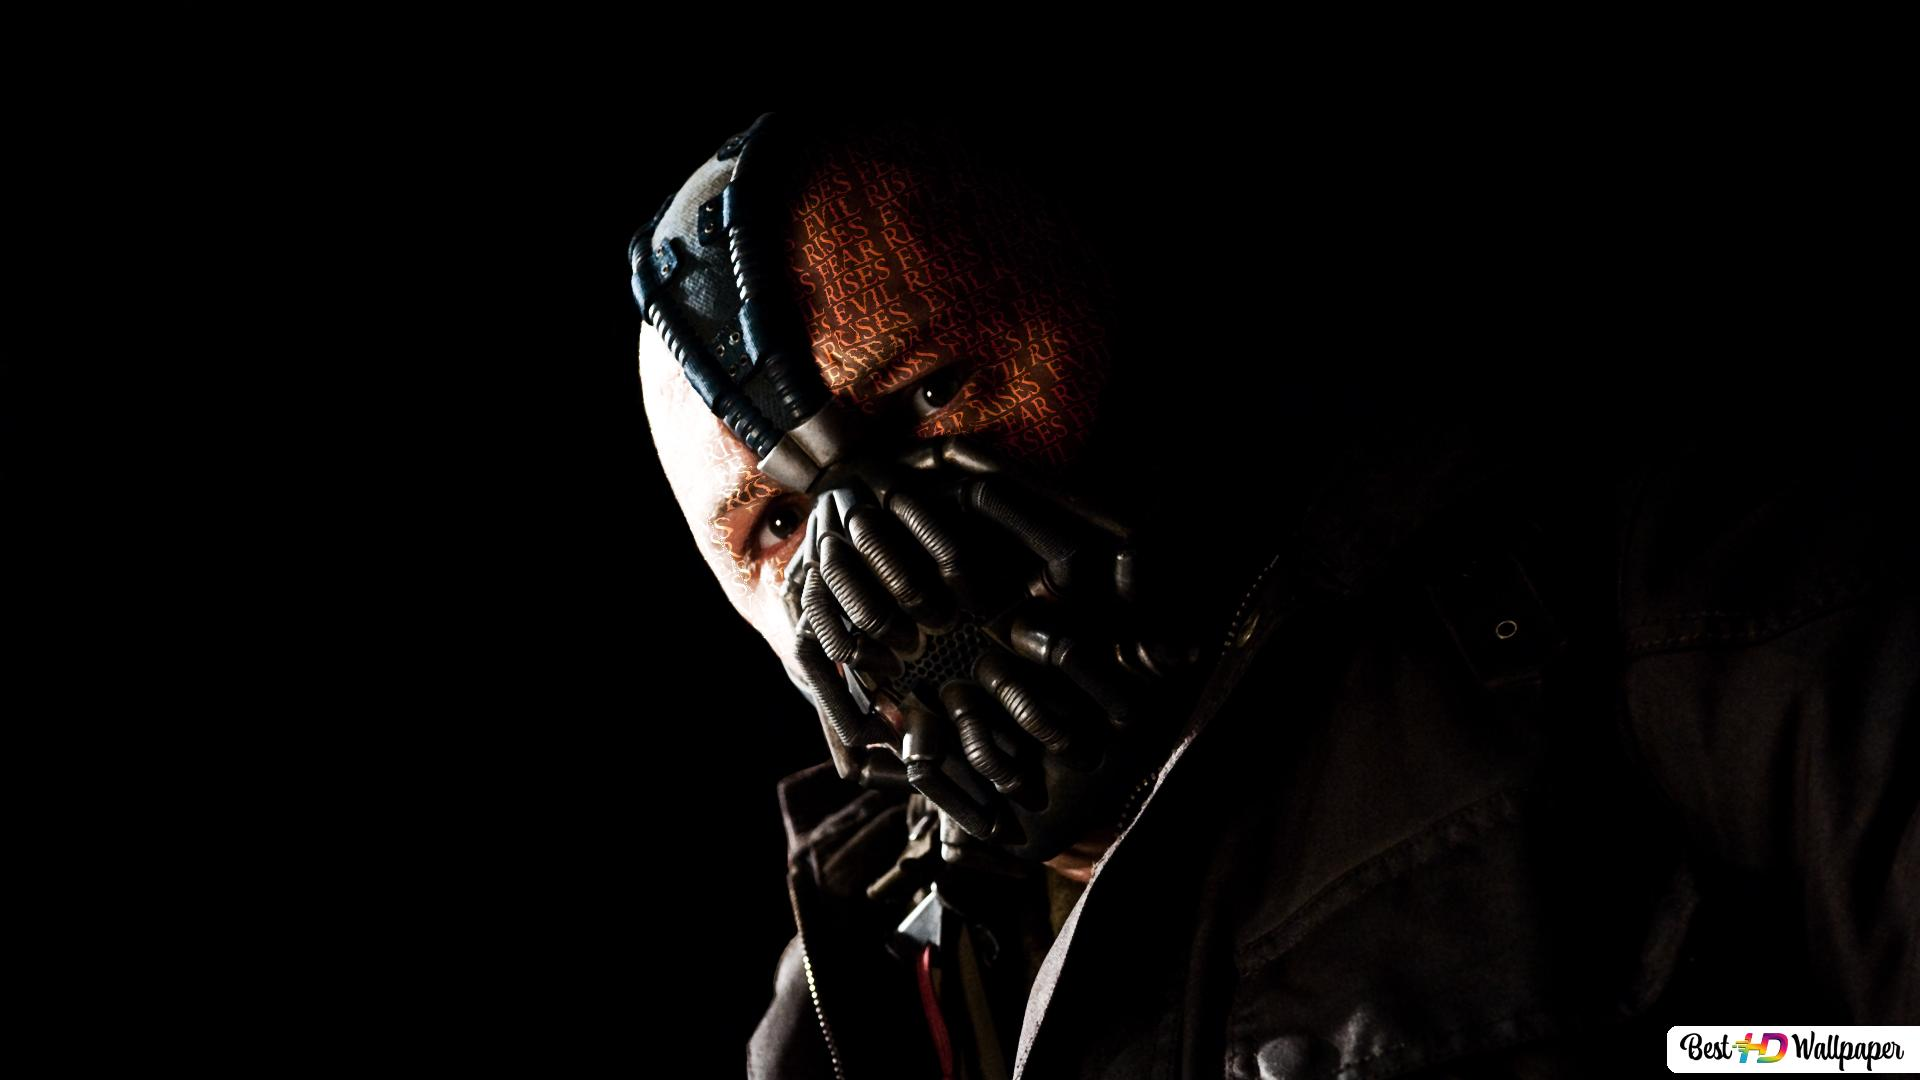 Bane Of The Dark Knight Rises Hd Wallpaper Download